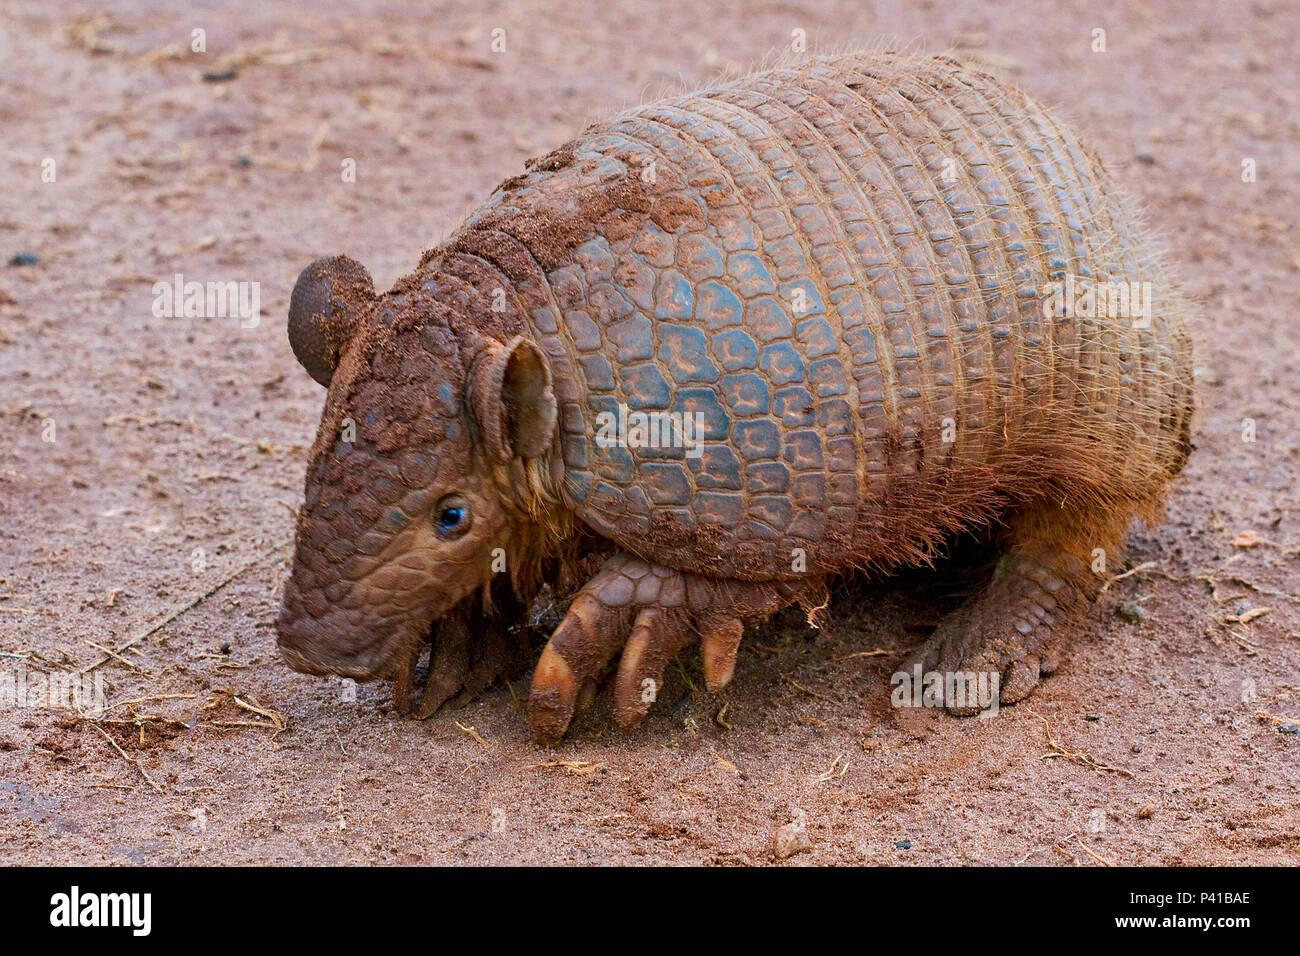 Tatu-peba; tatu-peludo; Euphractus sexcinctus; animal; fauna; Natureza; Pantanal; Aquidauana; Mato Grosso do Sul, Brasil Imagen De Stock